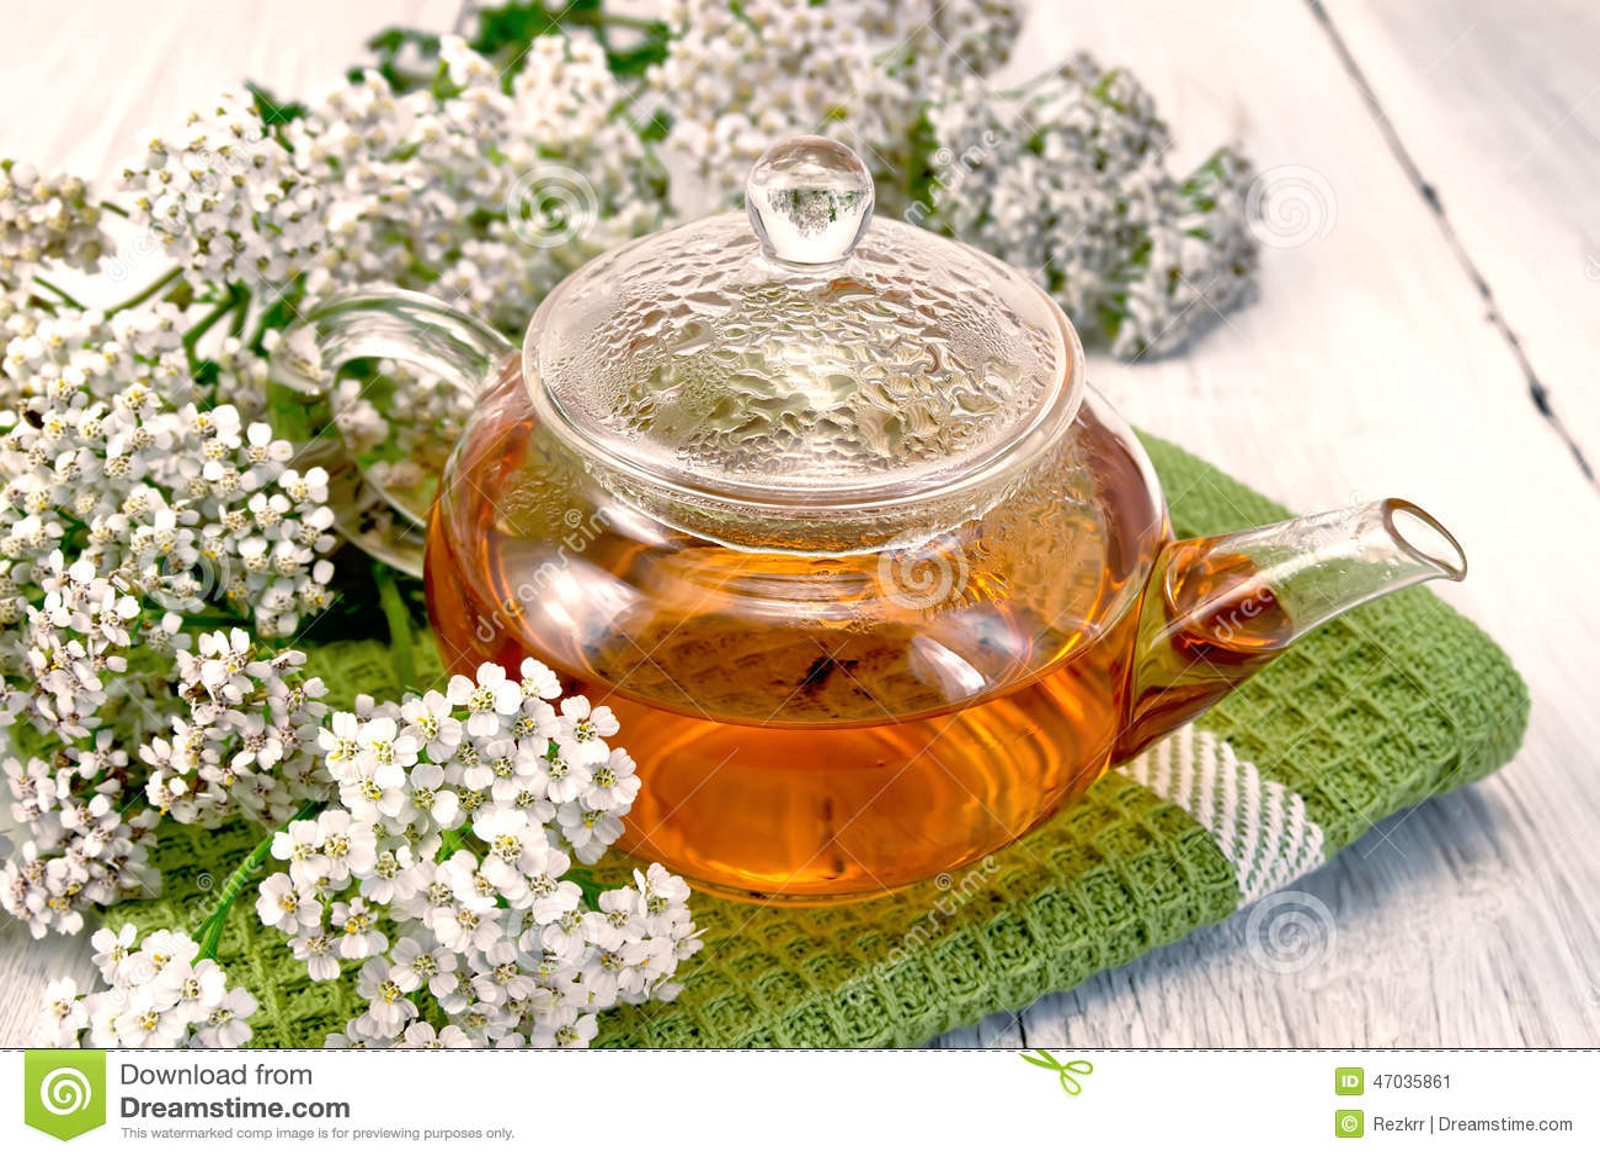 Tea with yarrow in glass teapot on napkin